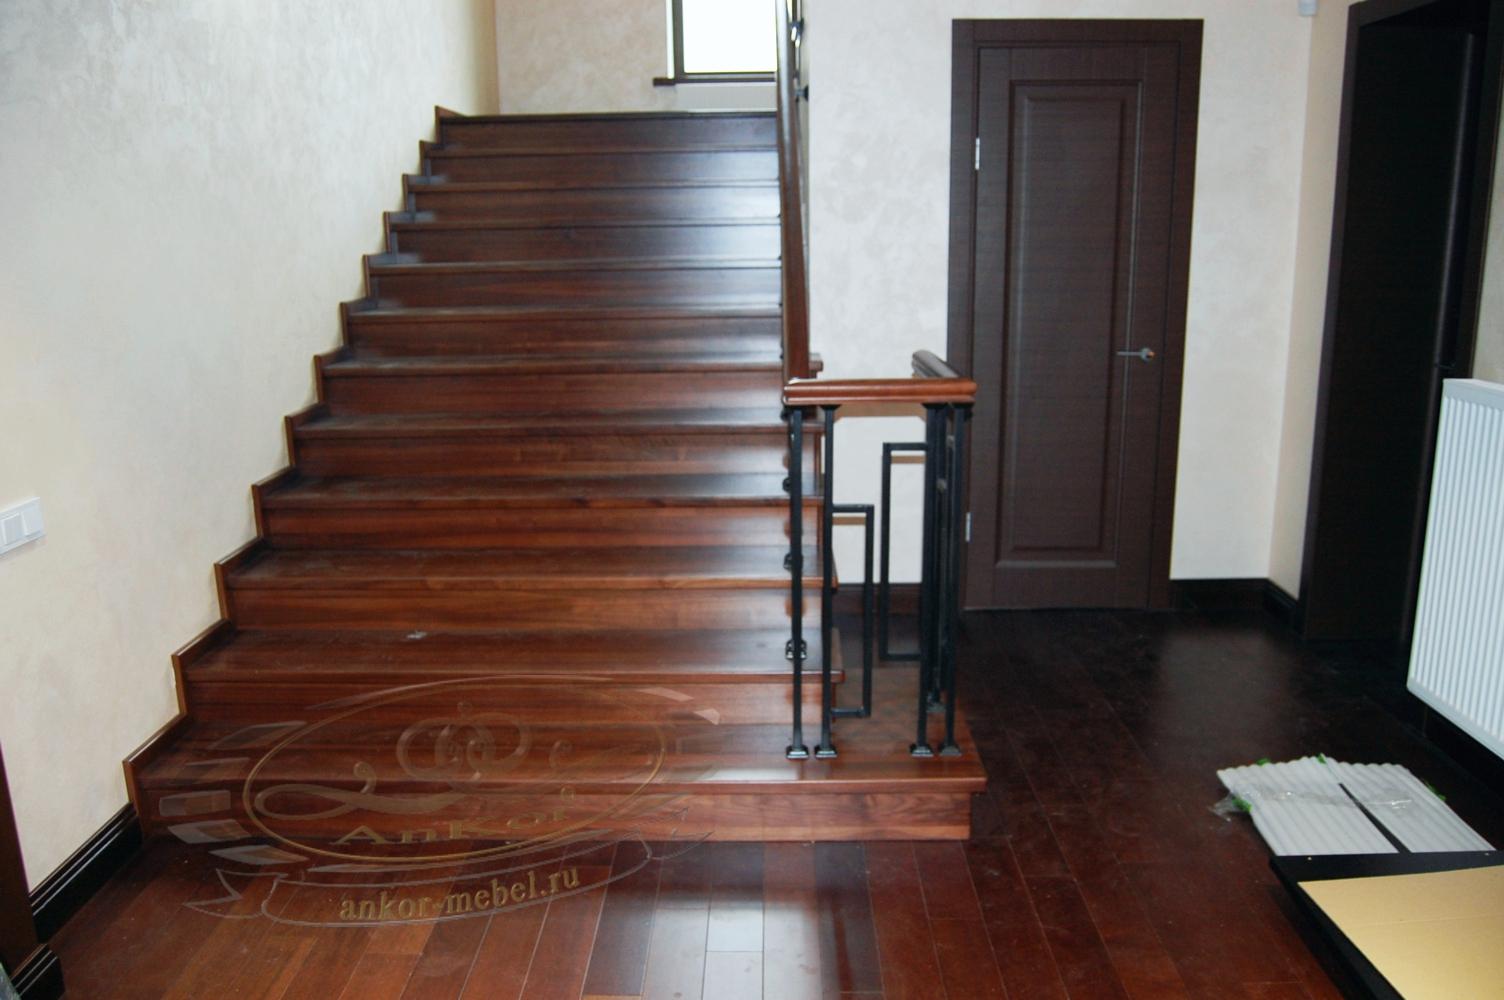 Лестницы0,2